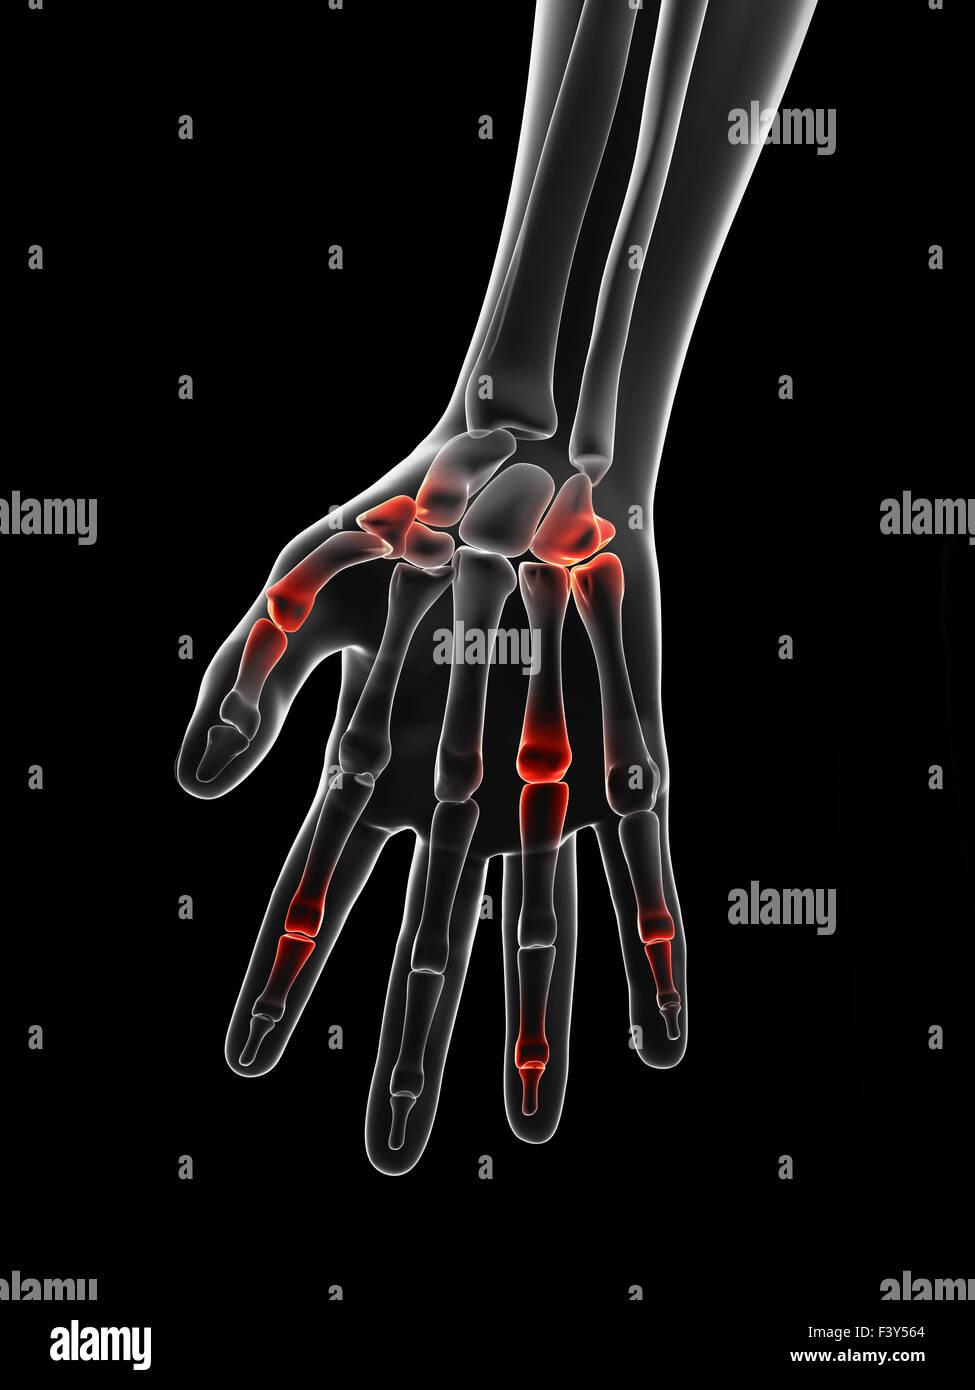 schmerzhafte Fingergelenke Stockbild